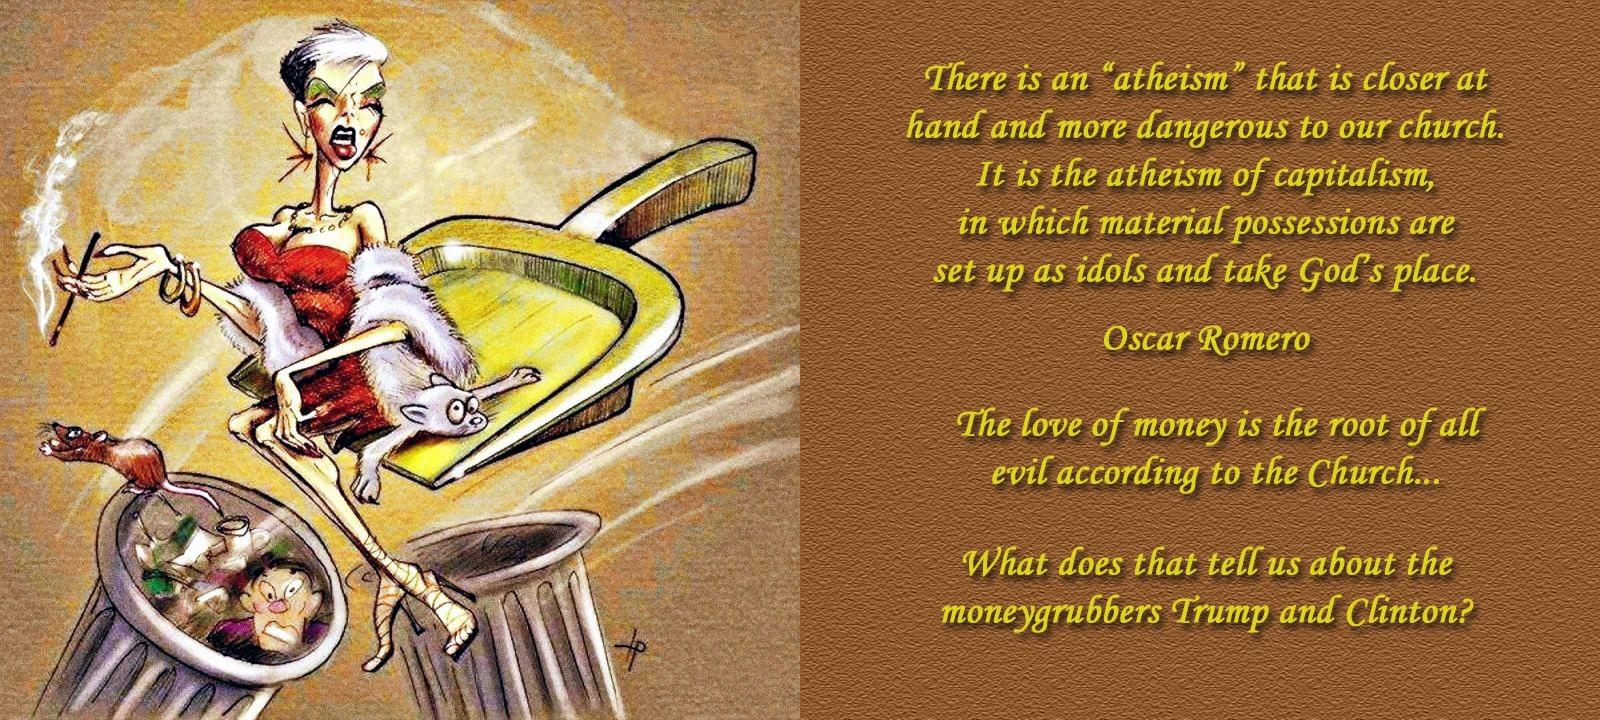 00 OSCAR ROMERO captialist atheism 070316